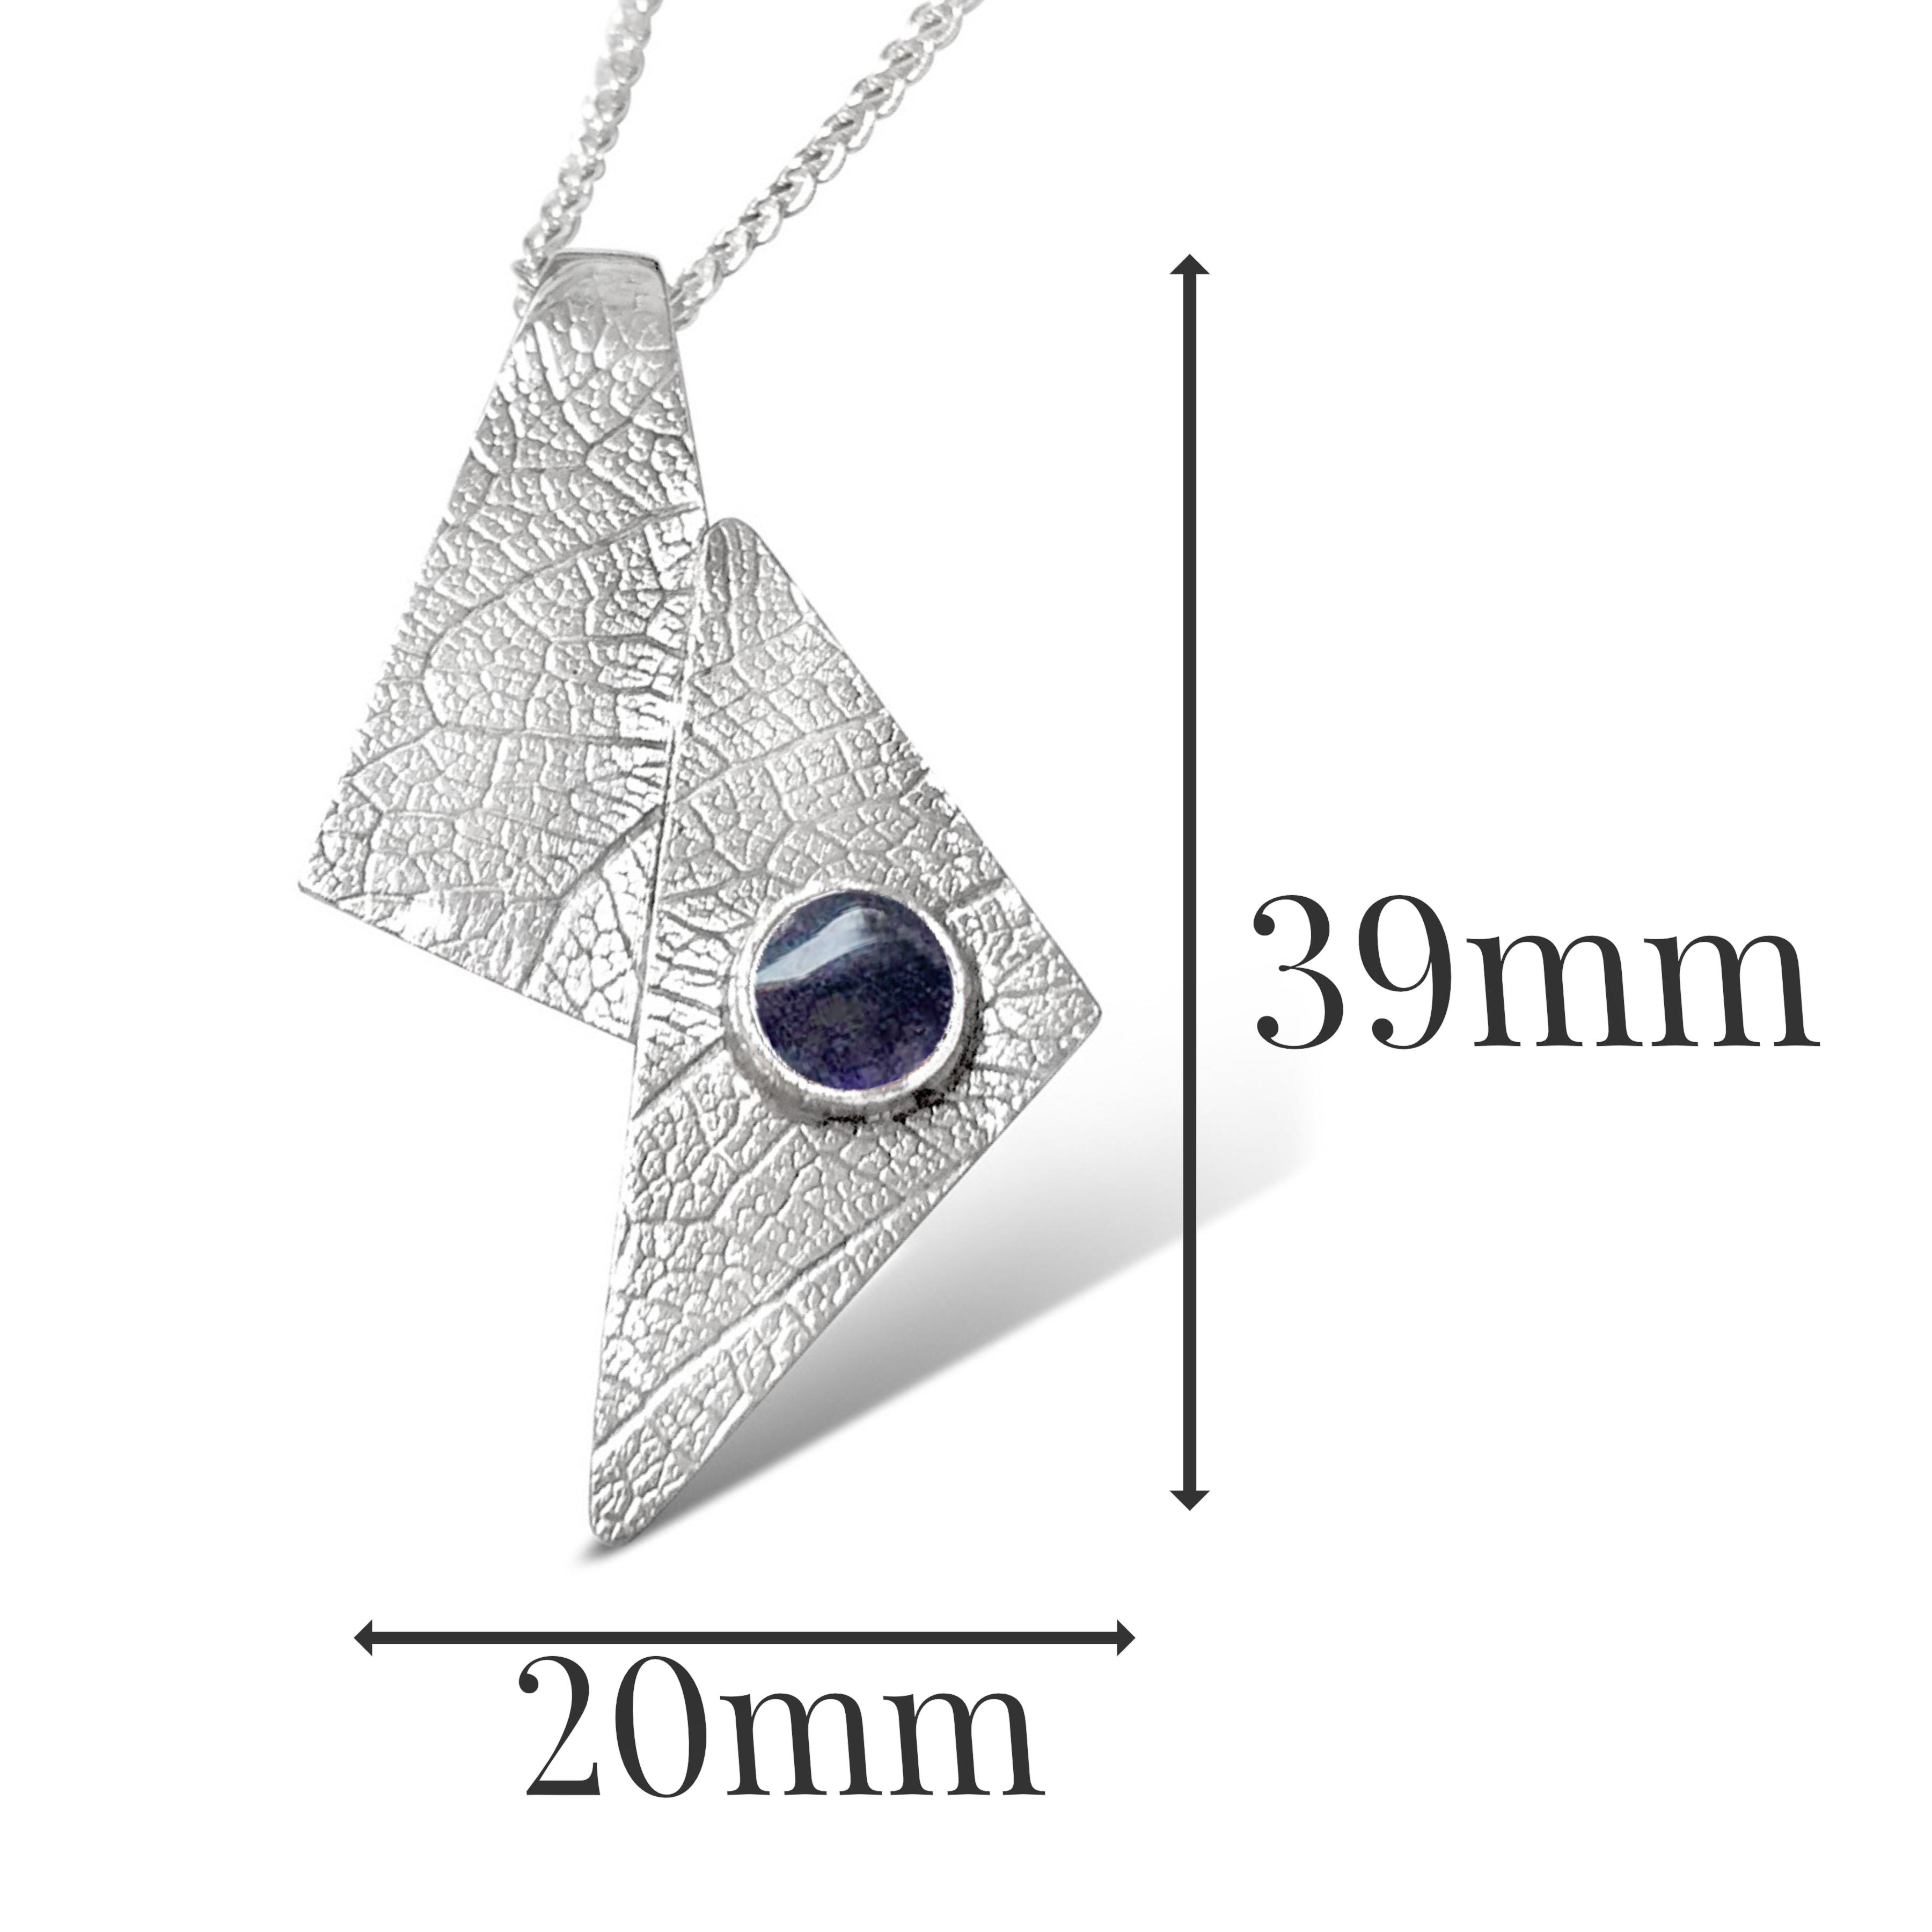 LP541 - Silver Iolite Pendant Sizes